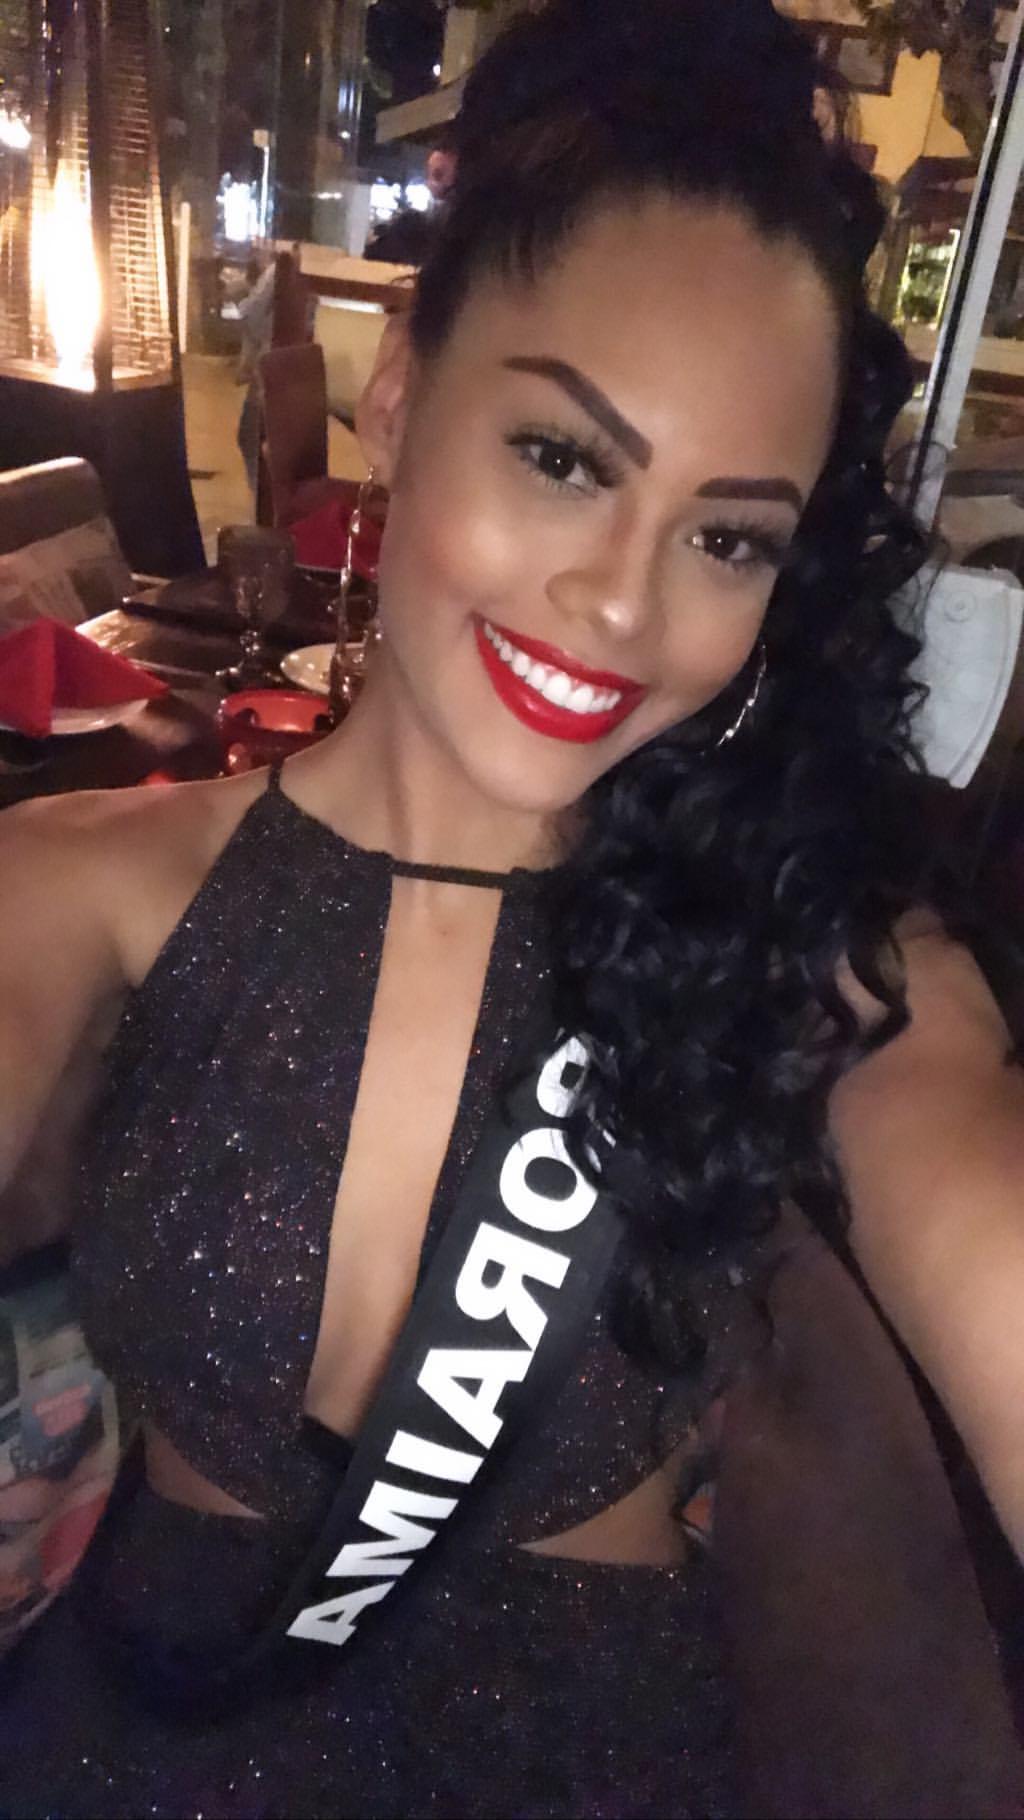 natali vitoria, top 15 de miss brasil universo 2019 /miss brasil teen universe 2017. primeira miss negra a vencer o miss roraima. - Página 11 52590810